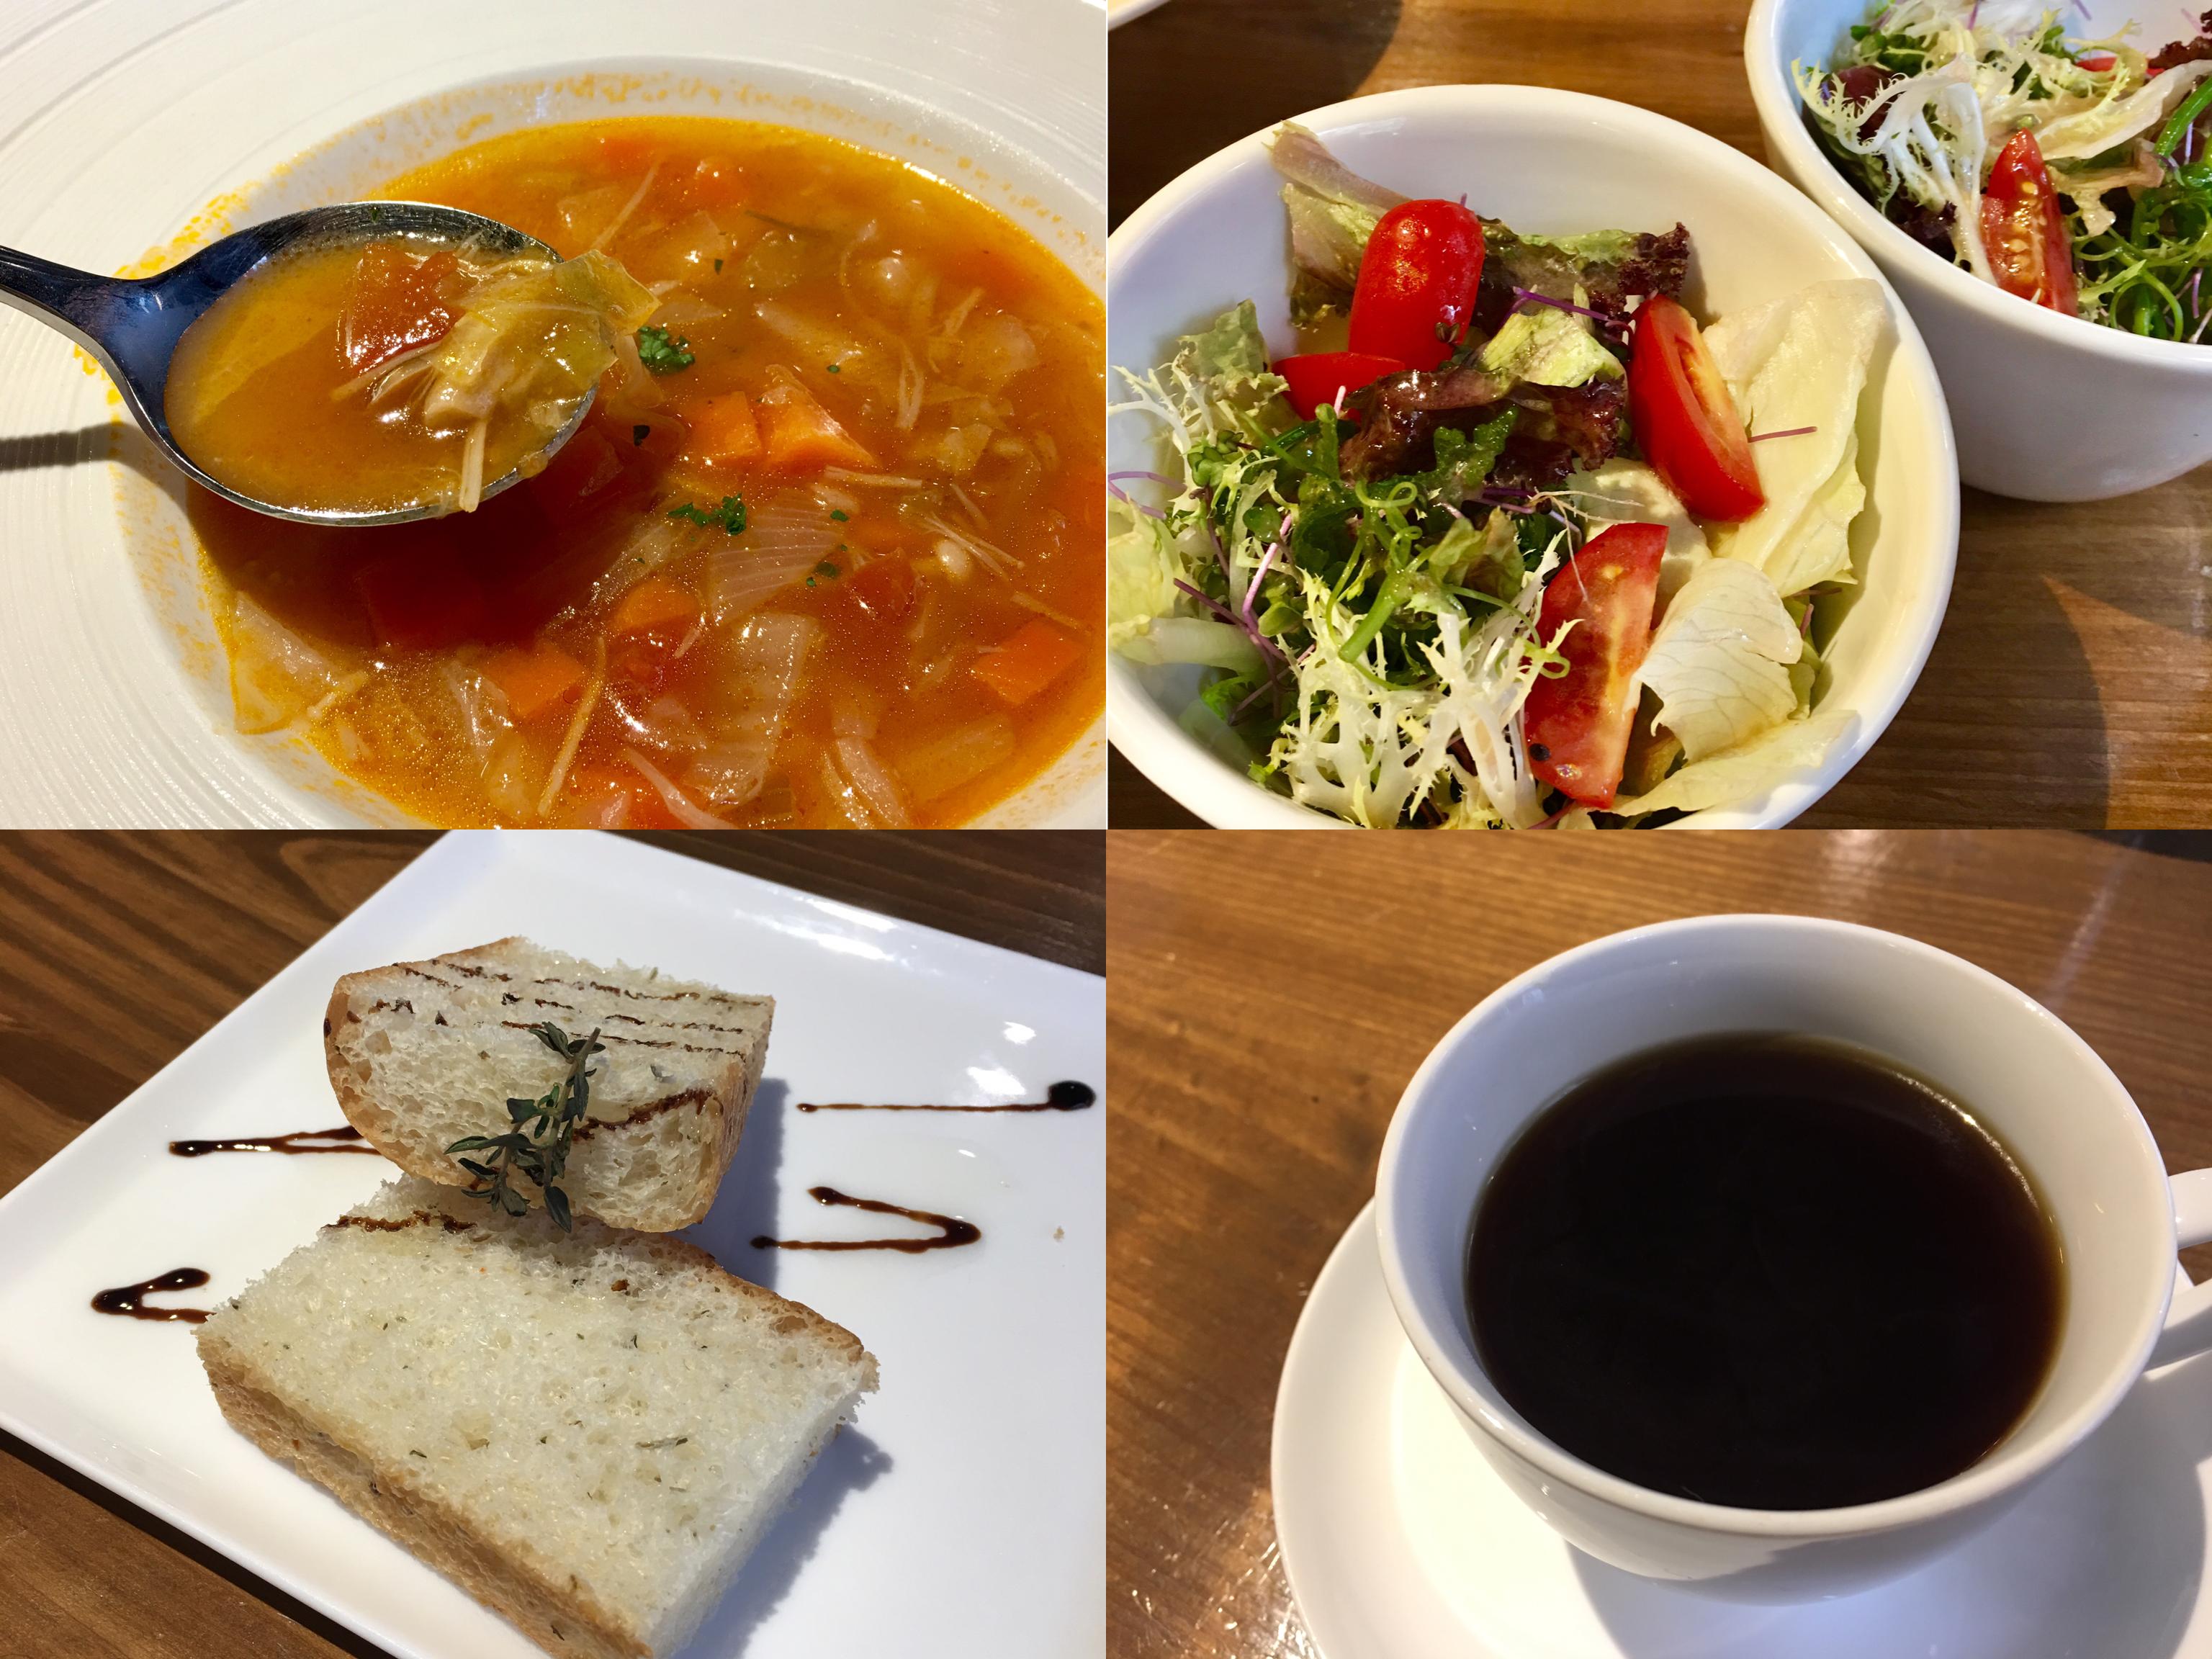 JK STUDIO新義法料理,商業午餐的附餐很豐盛